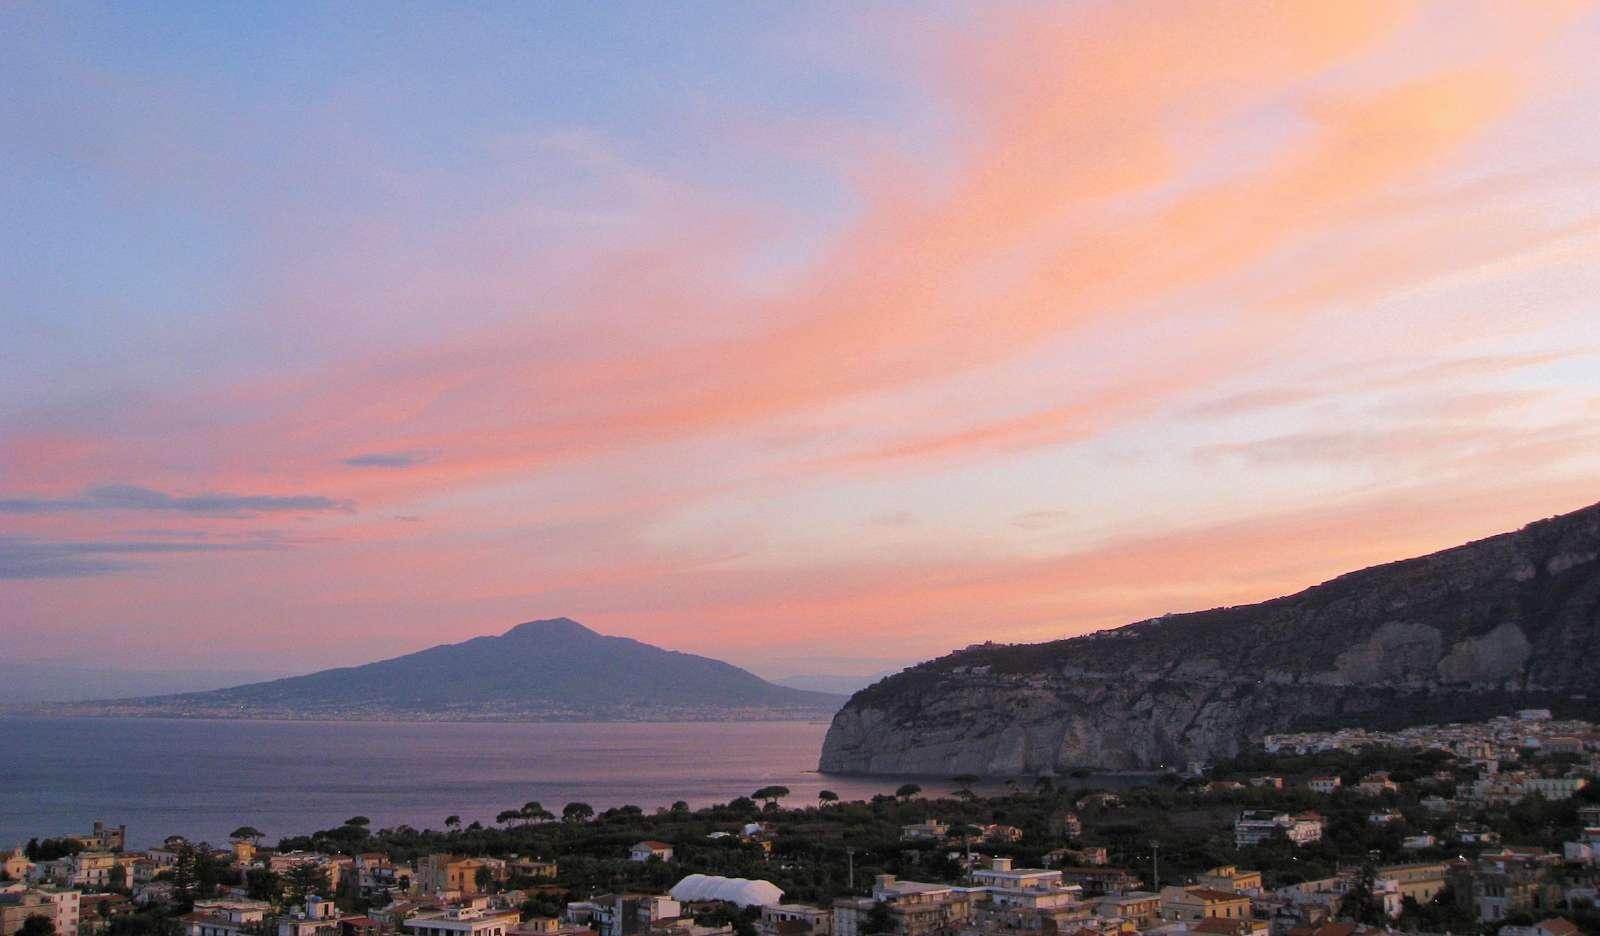 Vulkanen Vesuvius nära Sorrento